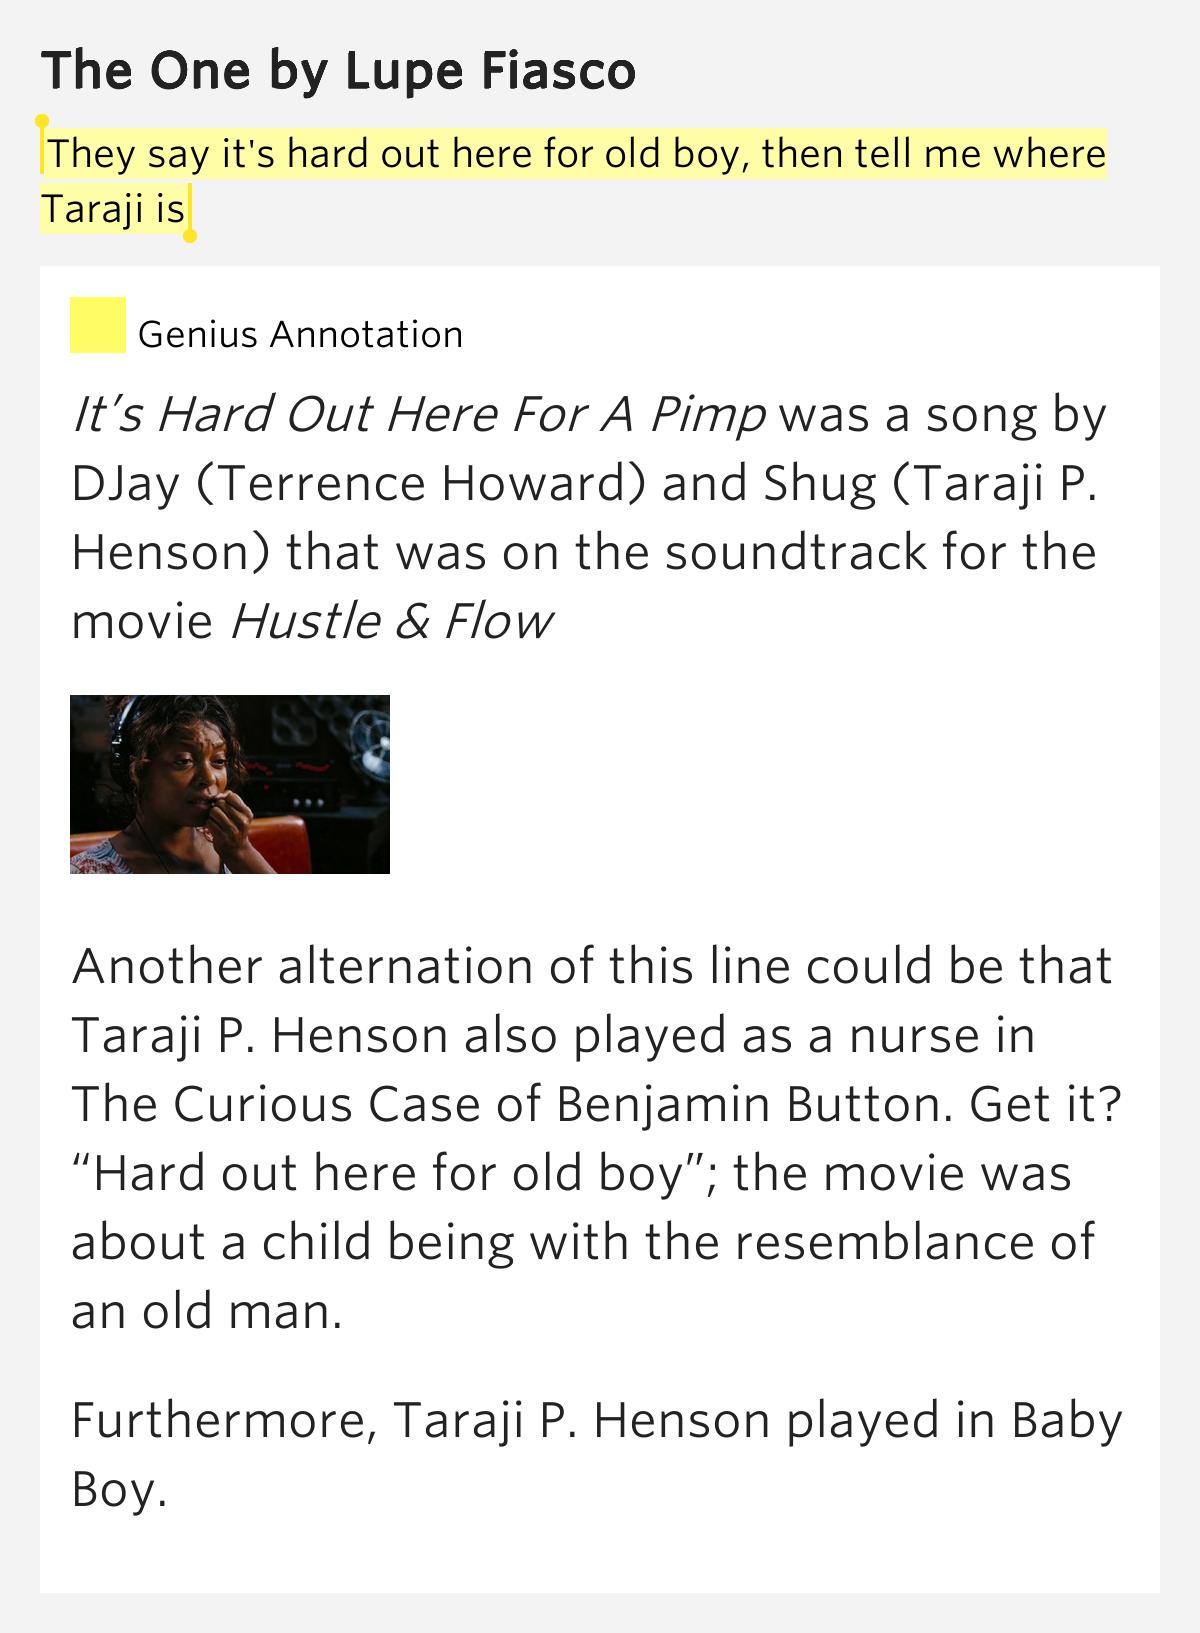 Djay - Its Hard Out For Pimp (Hustle and Flow Soundtrack ...